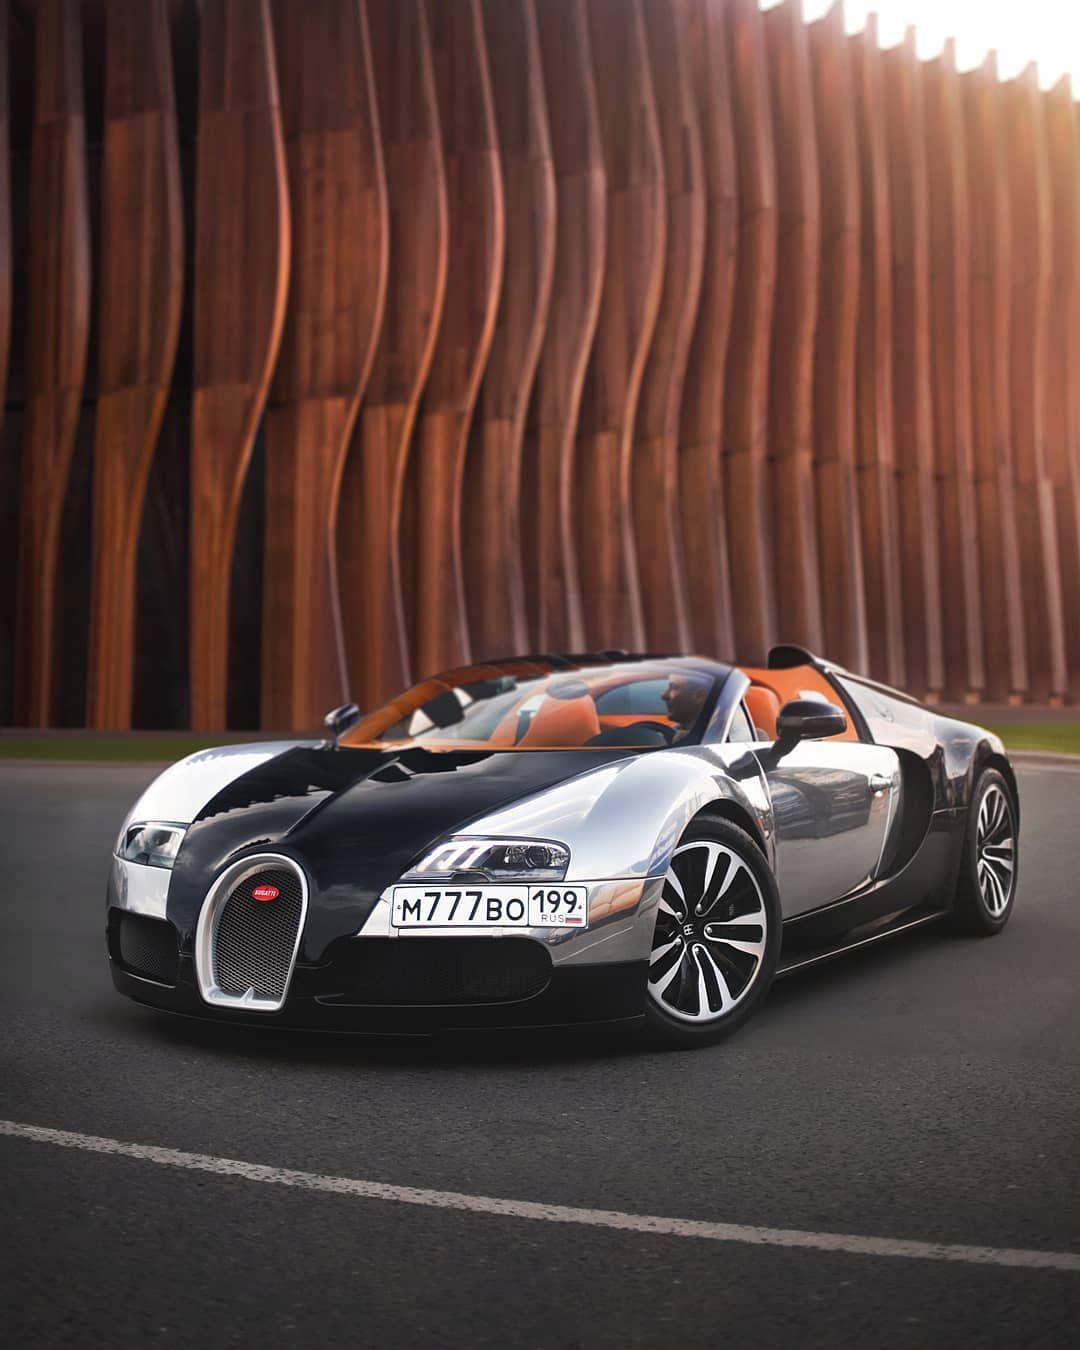 Bugatti Veyron Bugatti Cars Bugatti Veyron Bugatti